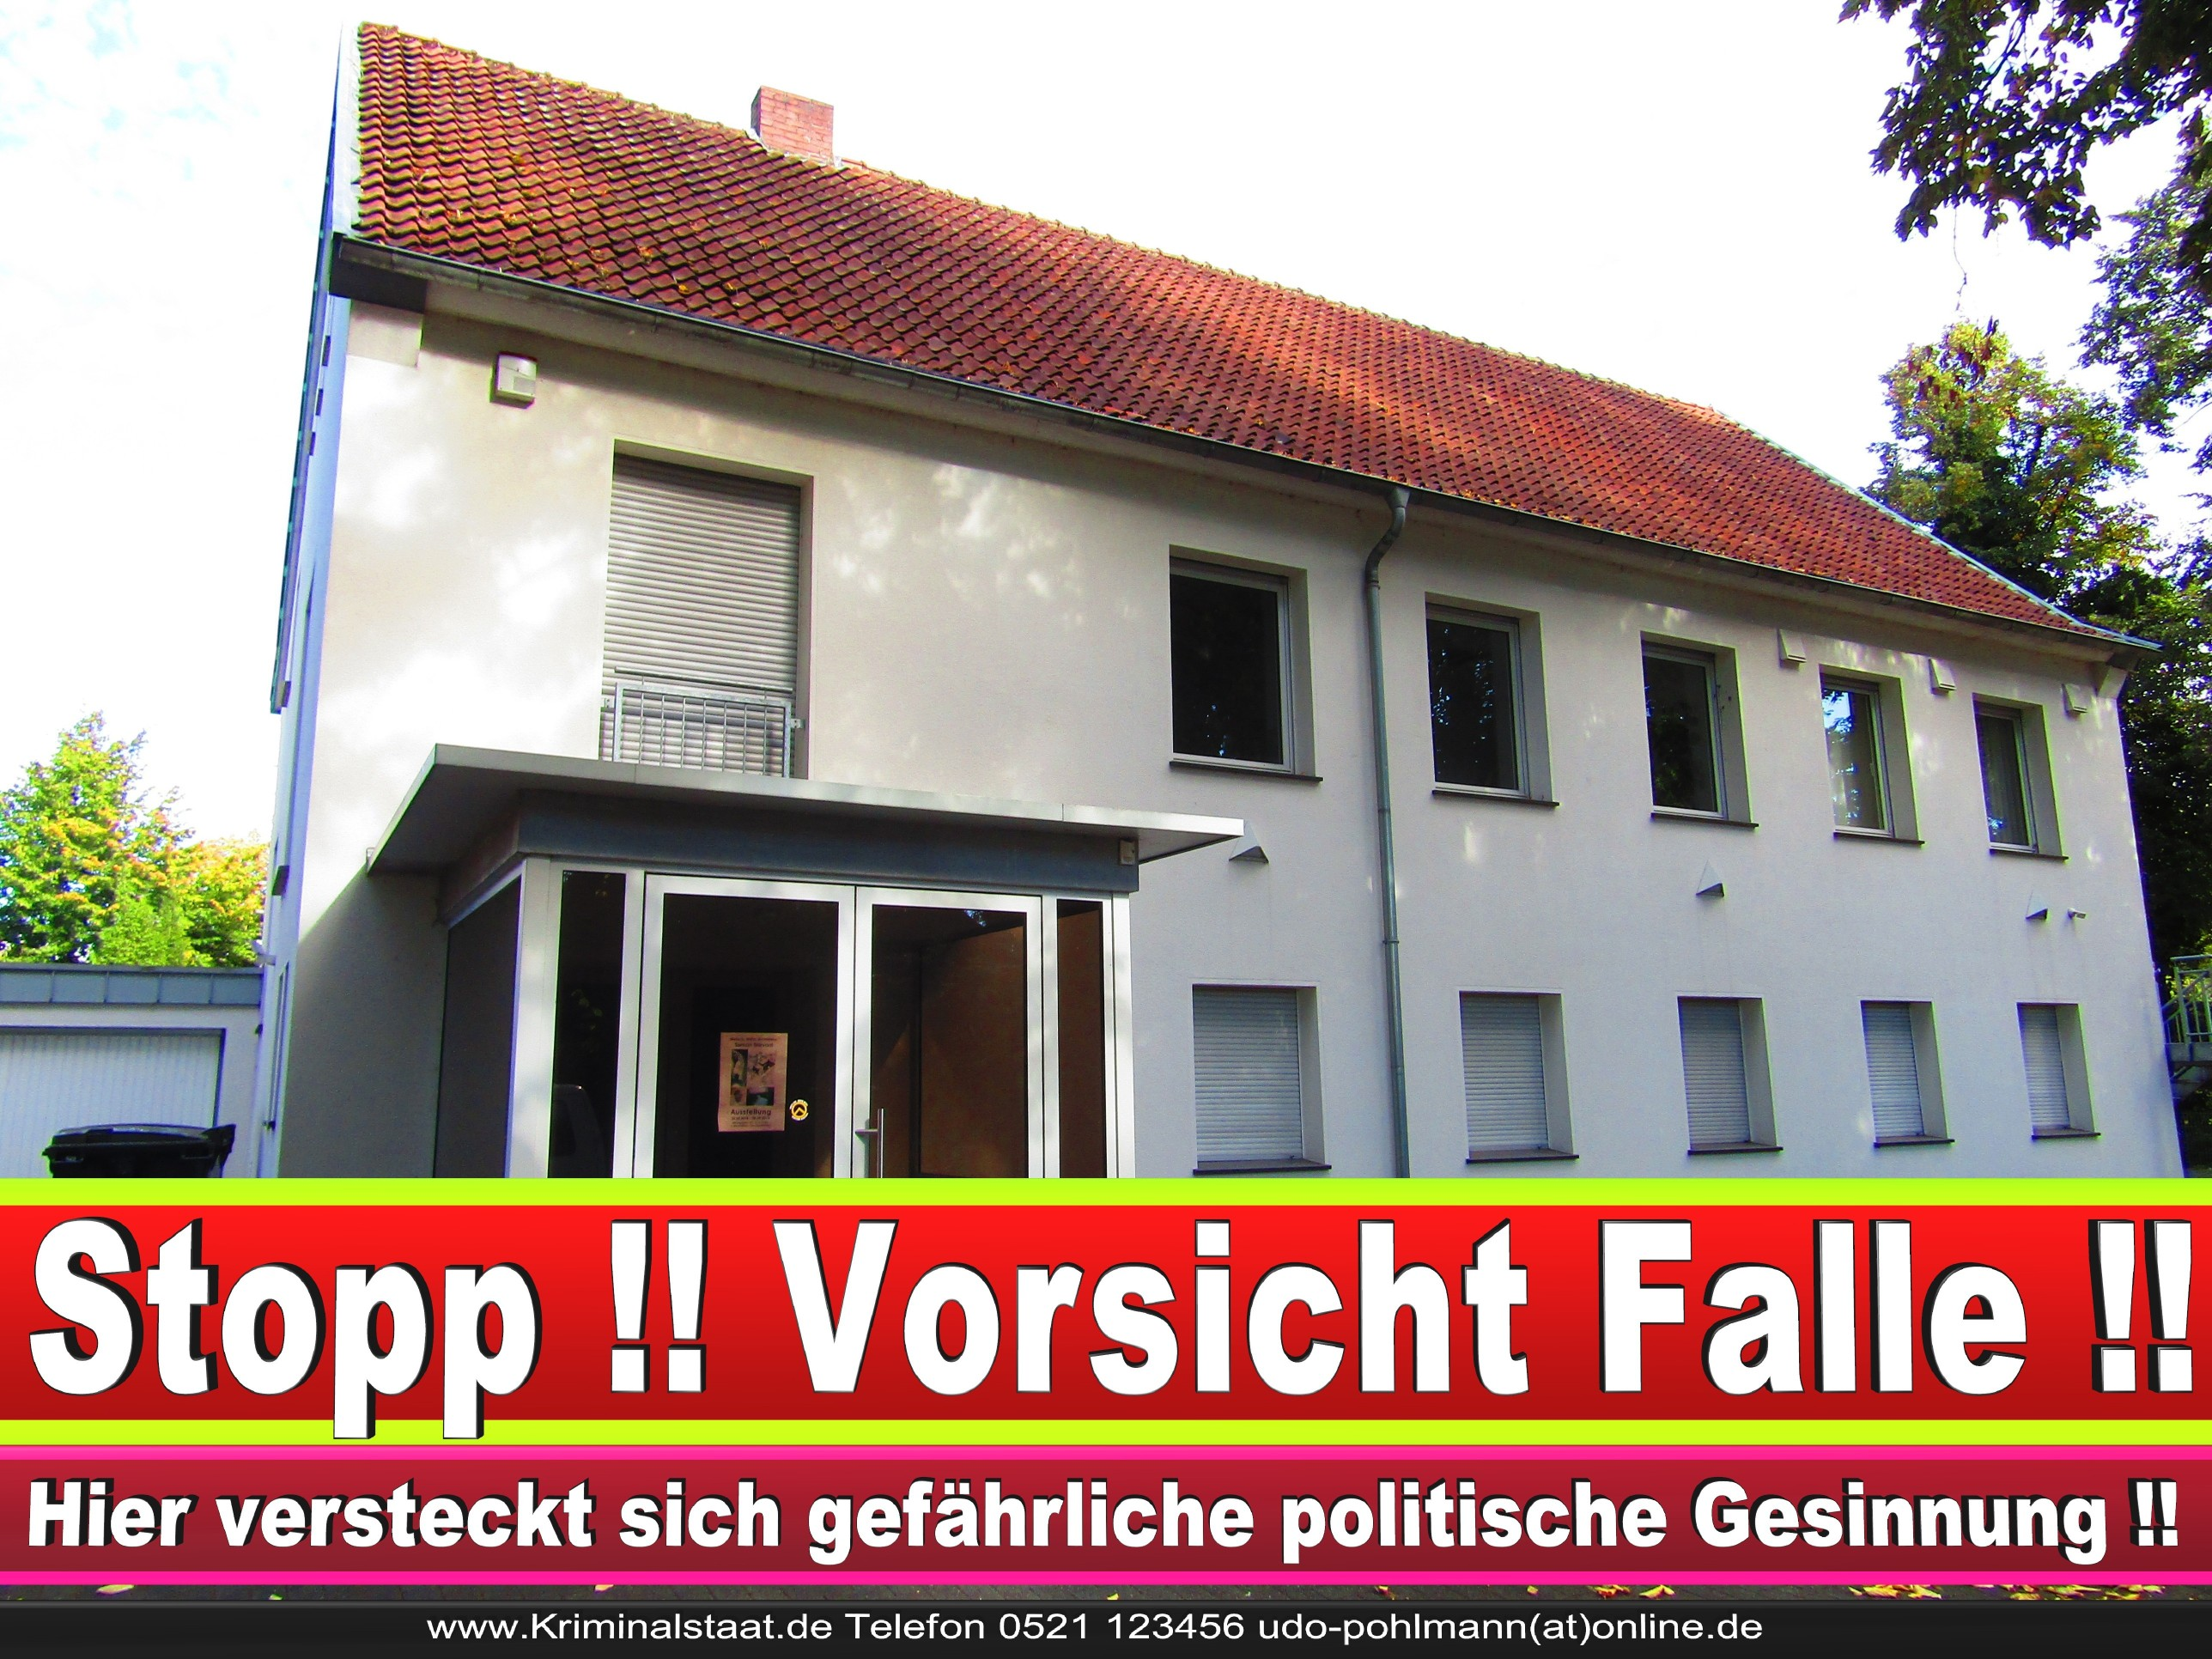 CDU GÜTERSLOH 2 LANDTAGSWAHL BUNDESTAGSWAHL BÜRGERMEISTERWAHL 1